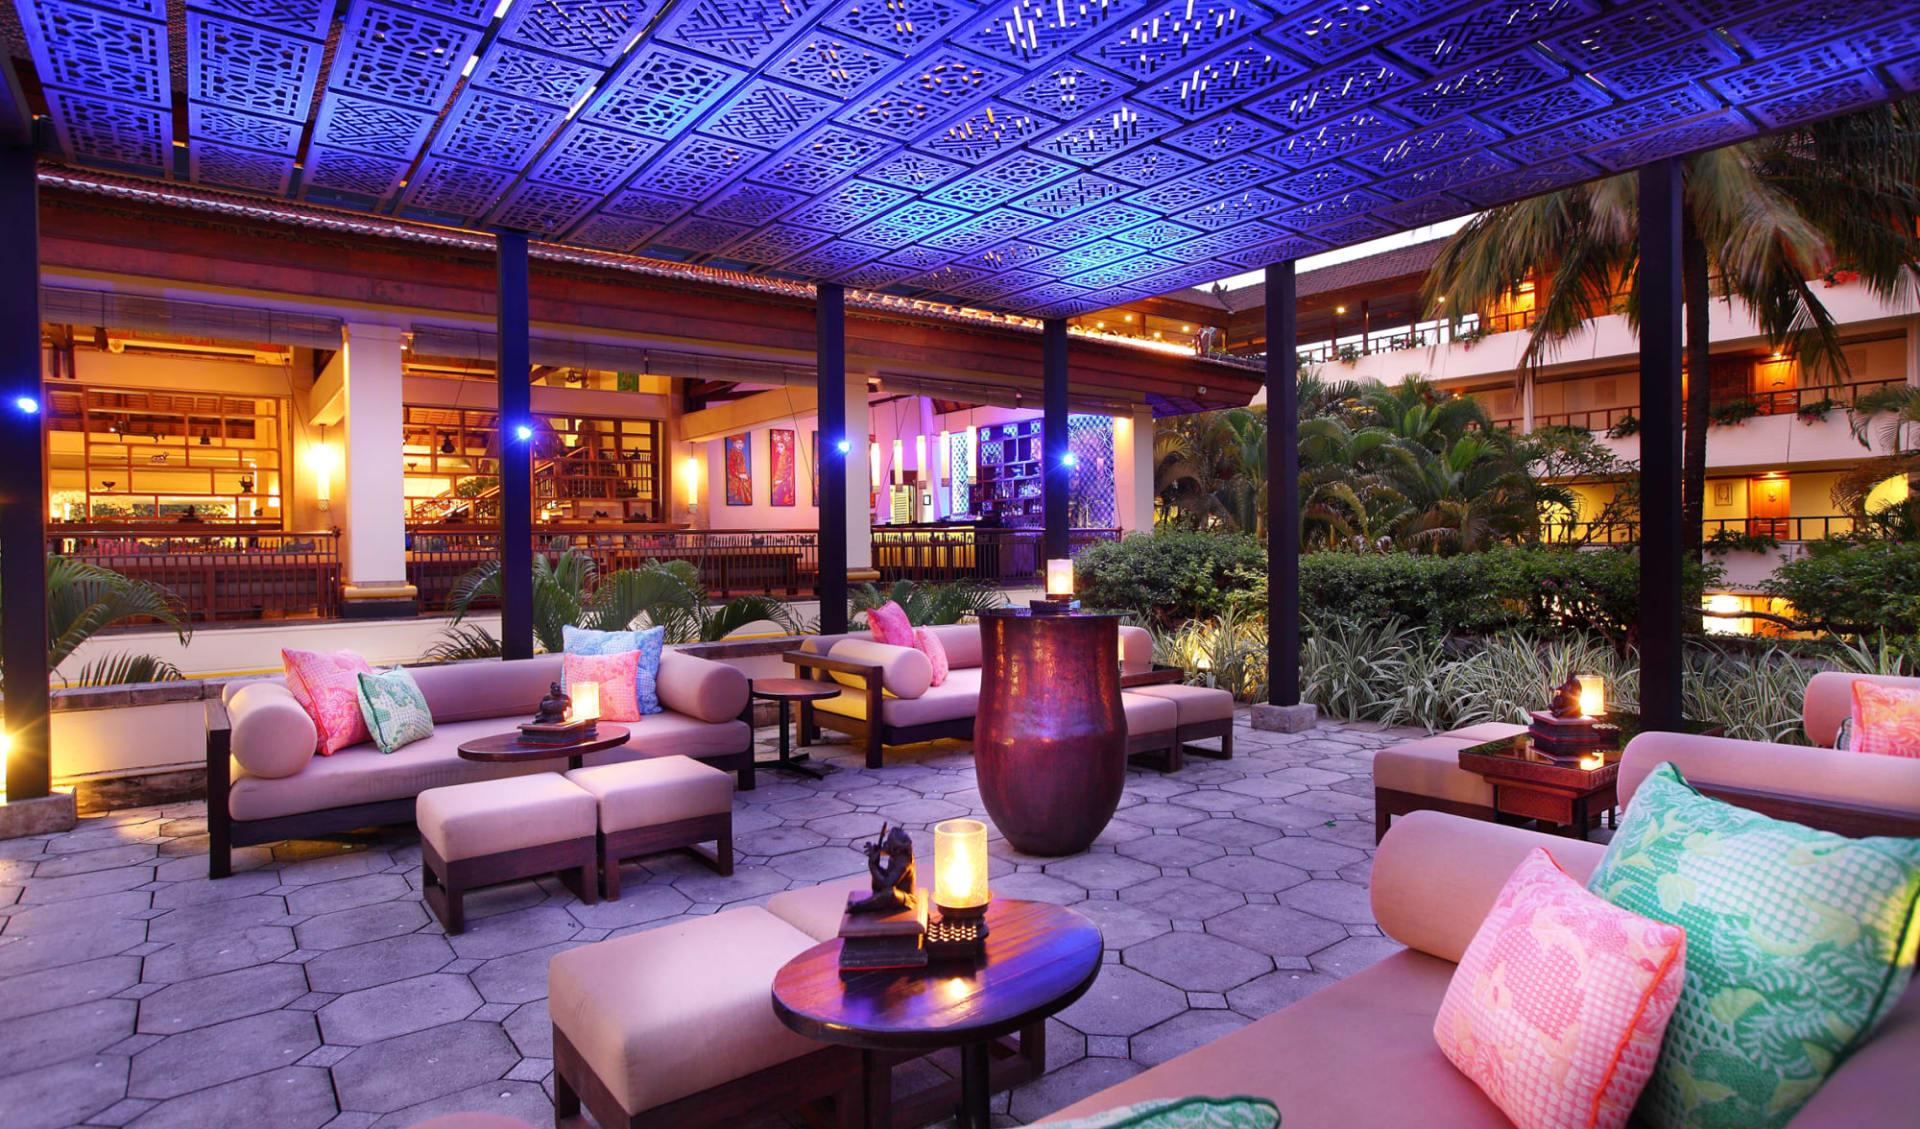 Nusa Dua Beach Hotel & Spa in Südbali: The Lobby Bar Terrace